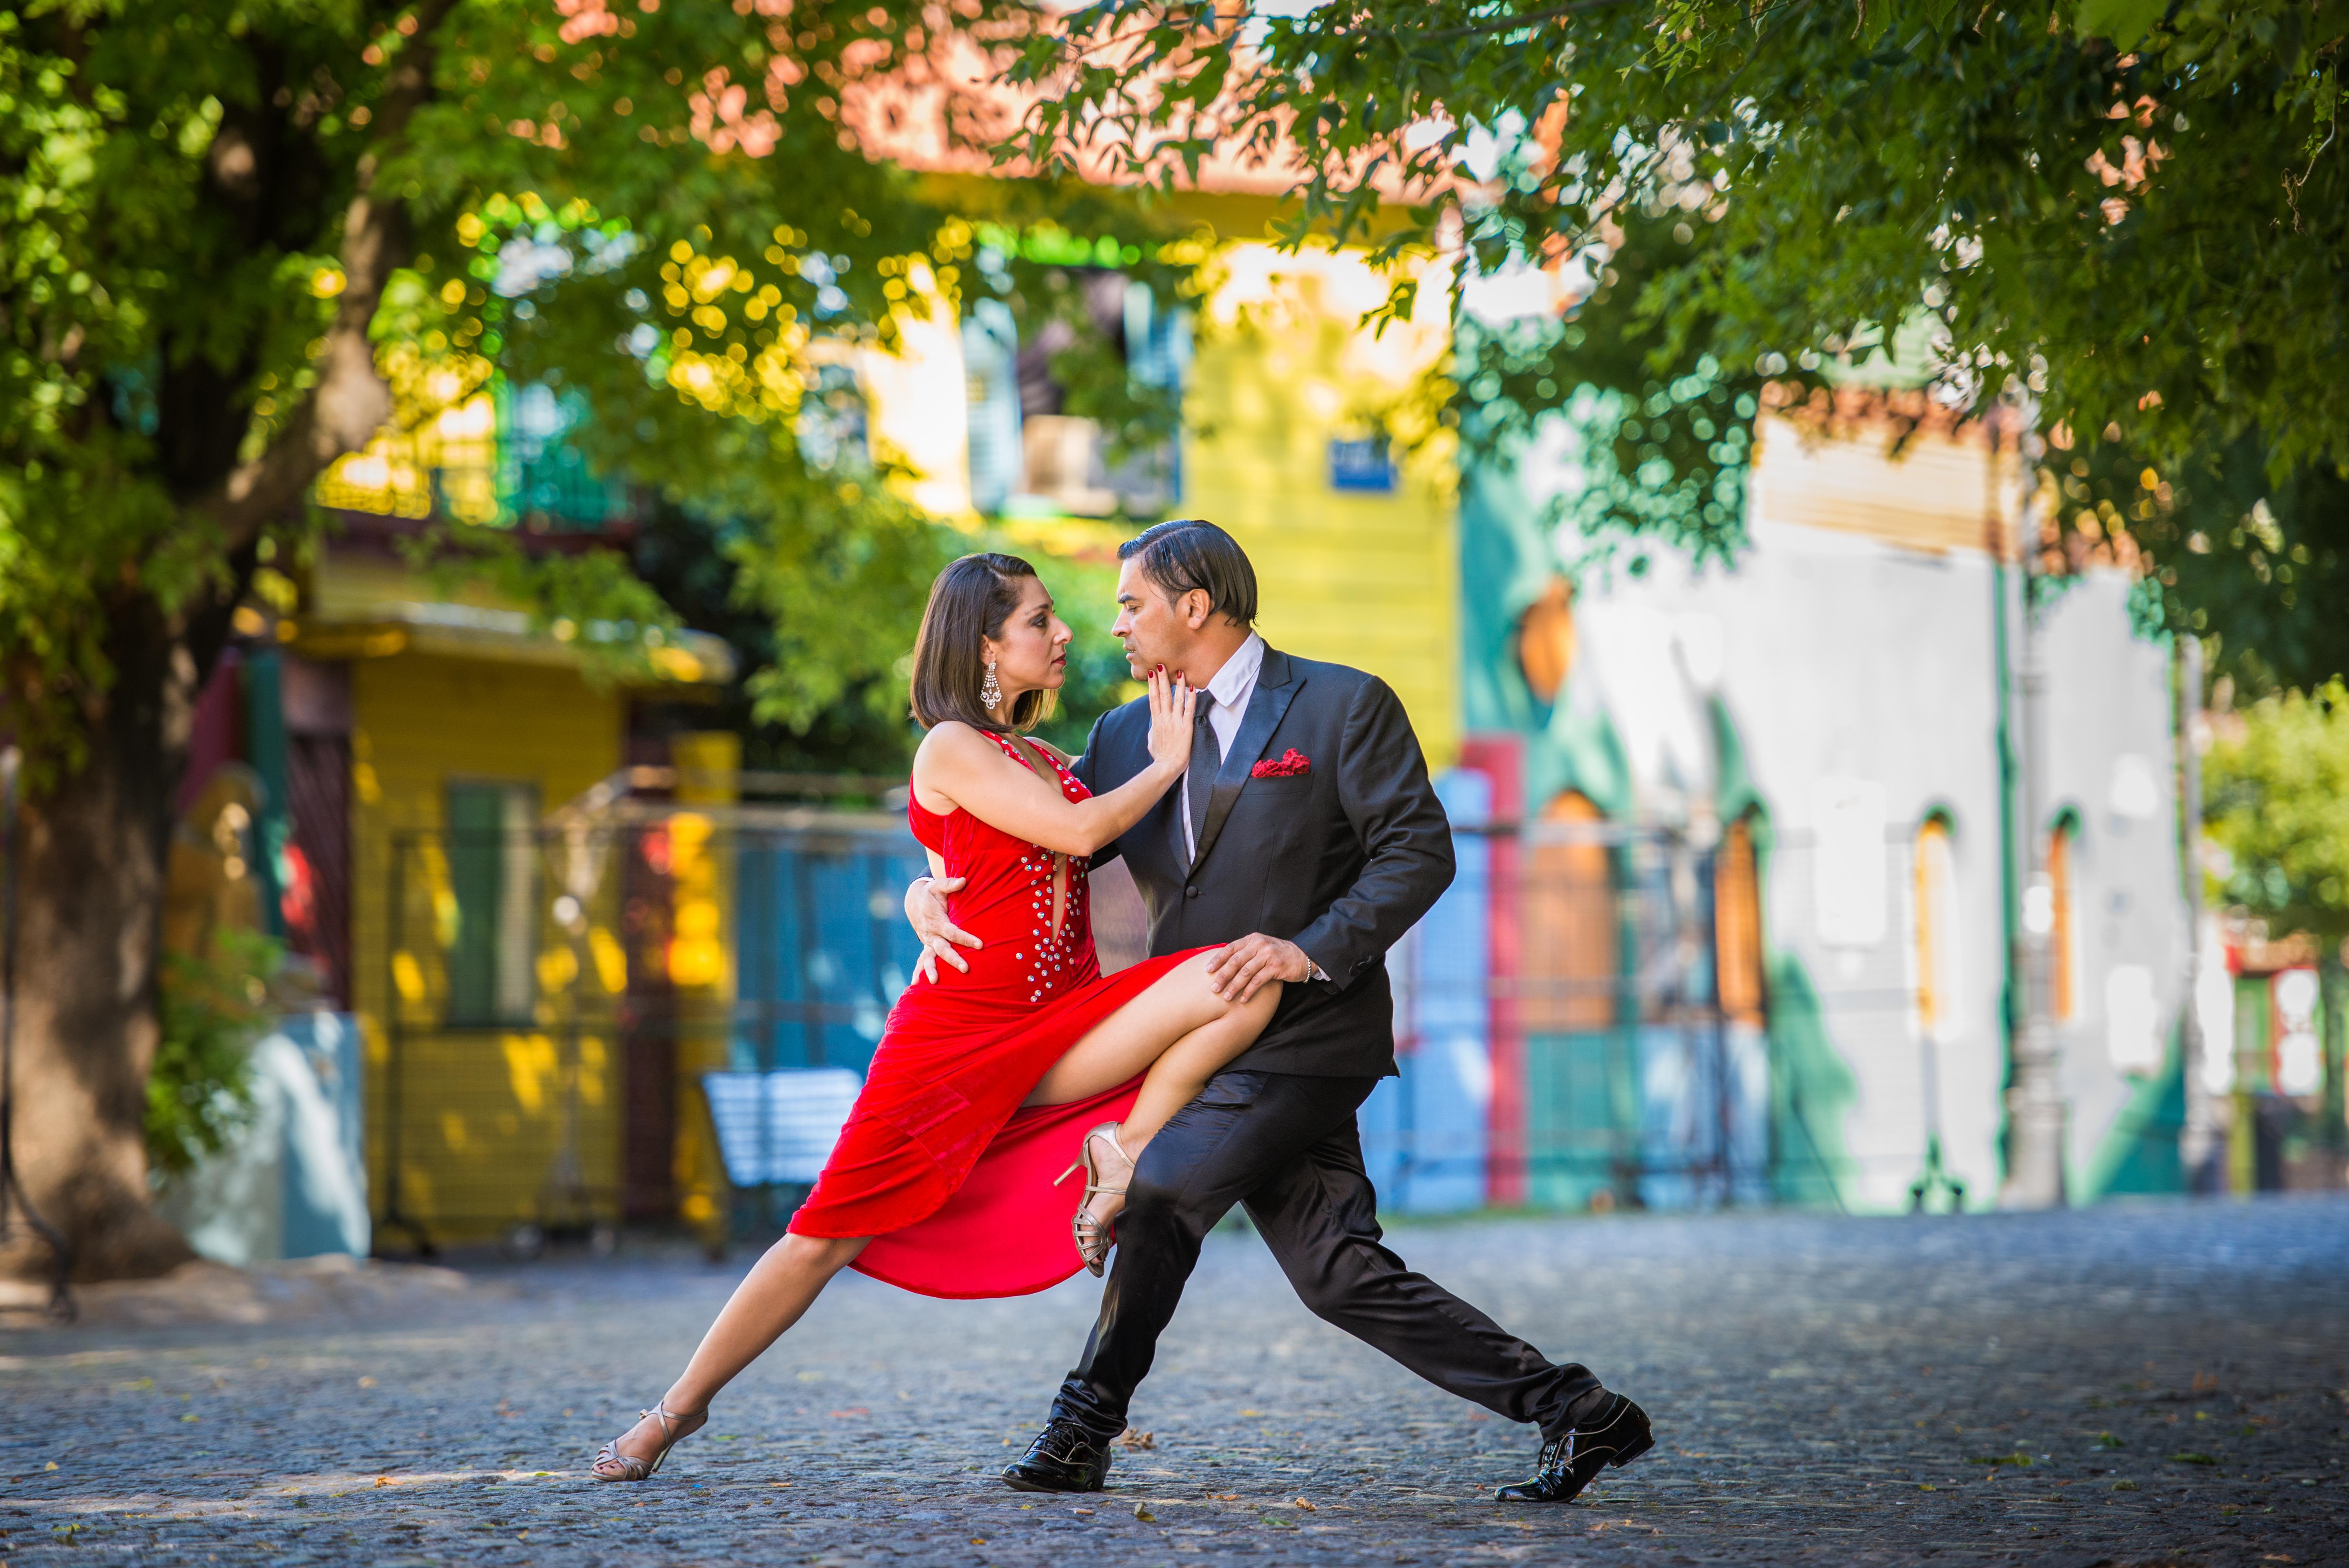 Tango on Caminito Street (Buenos Aires, Argentina)